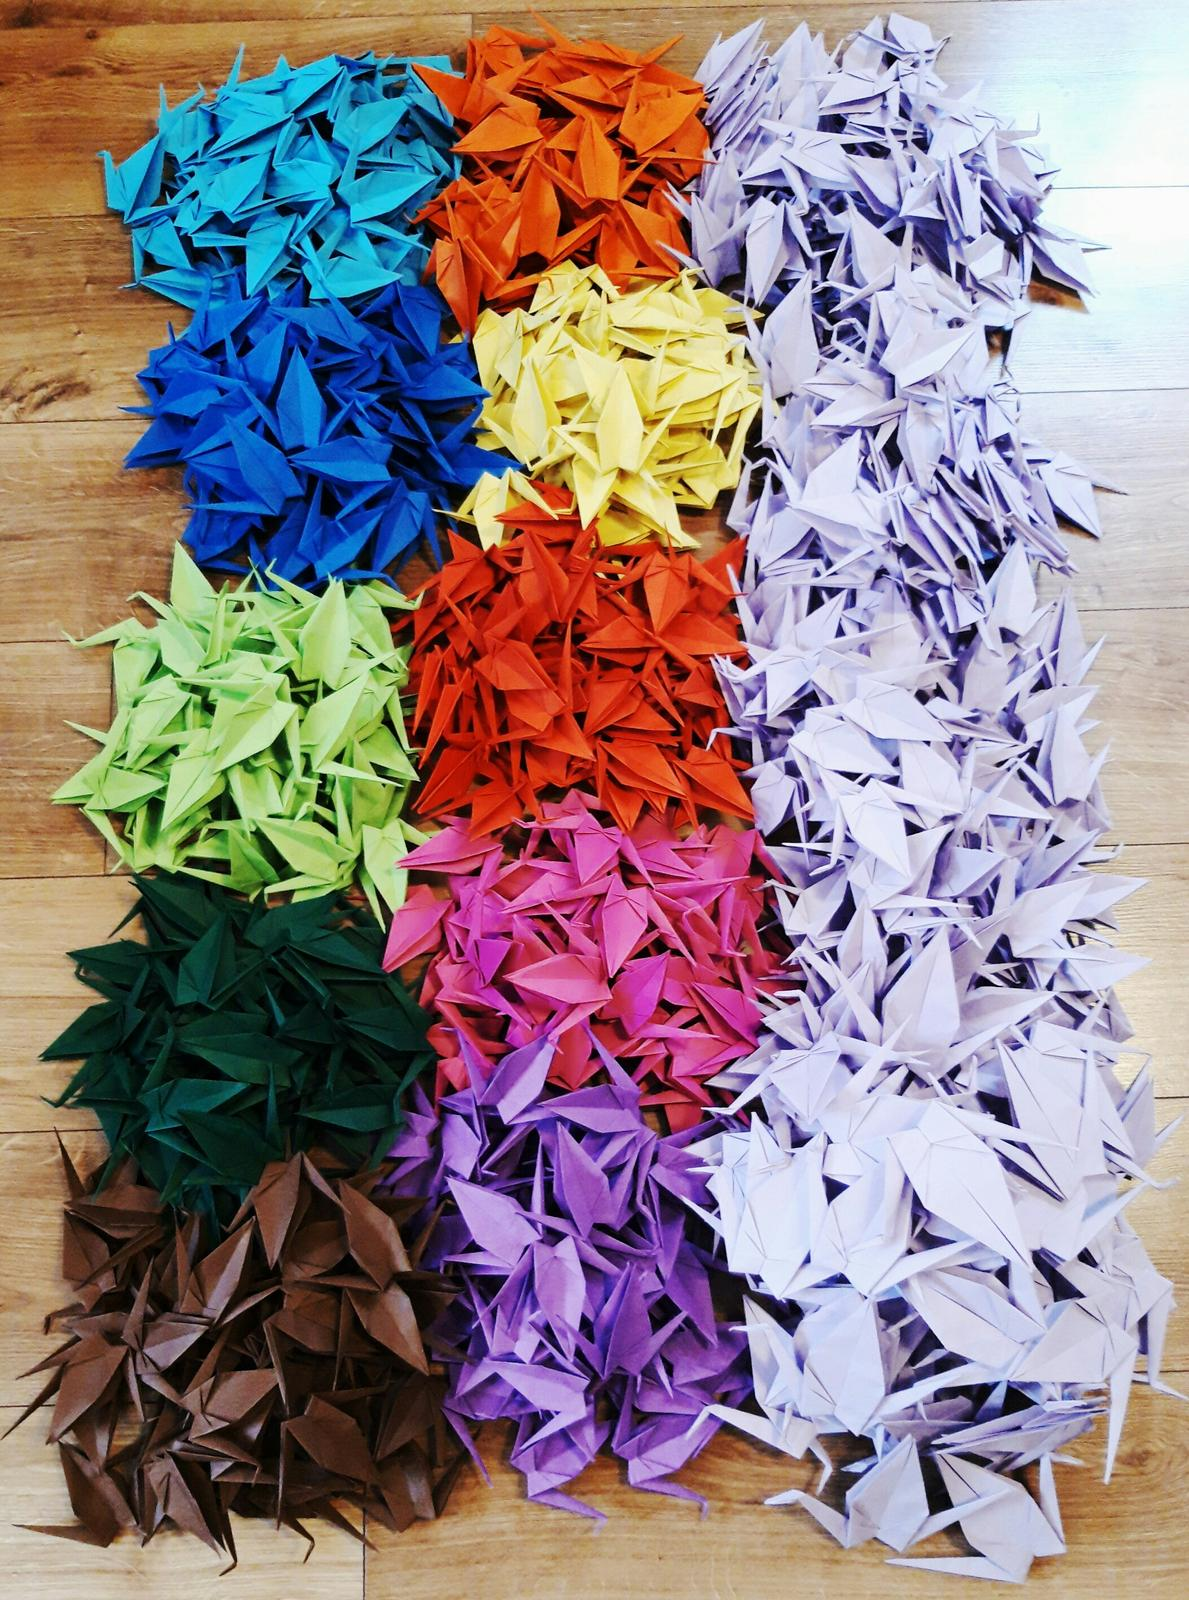 Origami jeřábi dekorace  - Obrázek č. 3